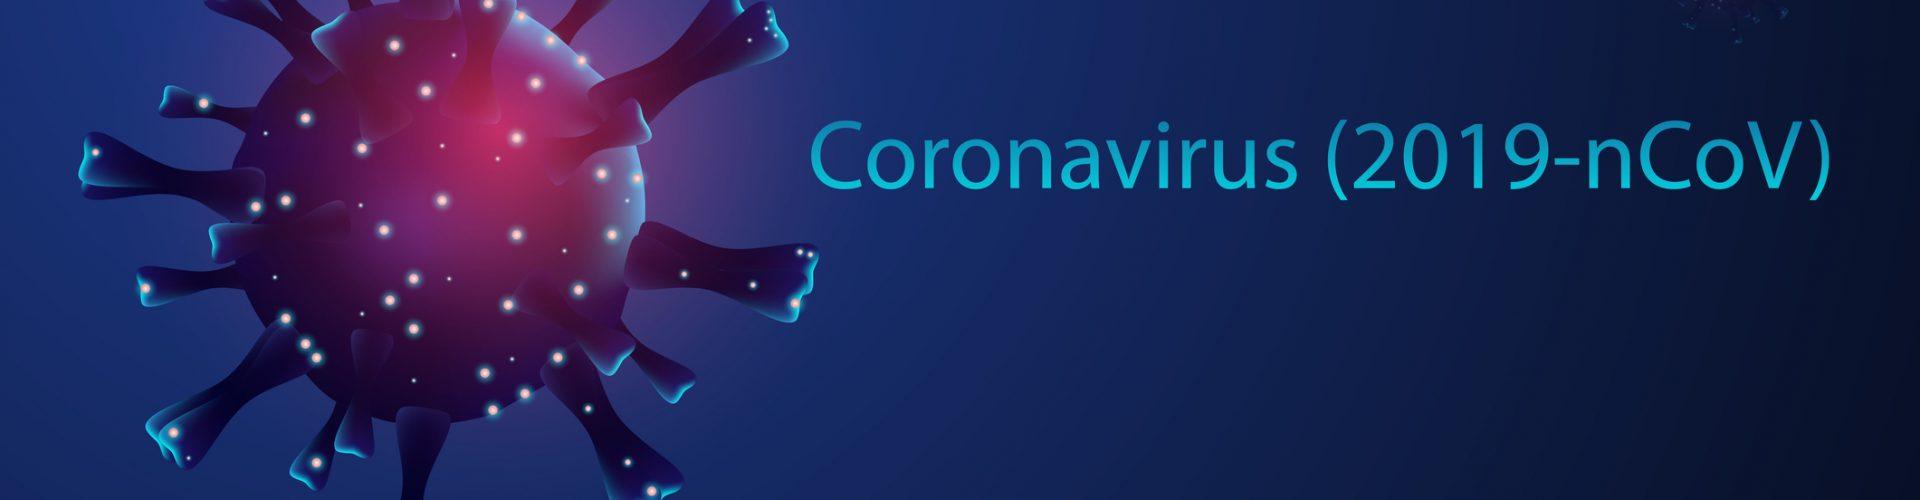 Pandemic virus and Medicine pills antiviral drug corona virus concept. Vector illustration design